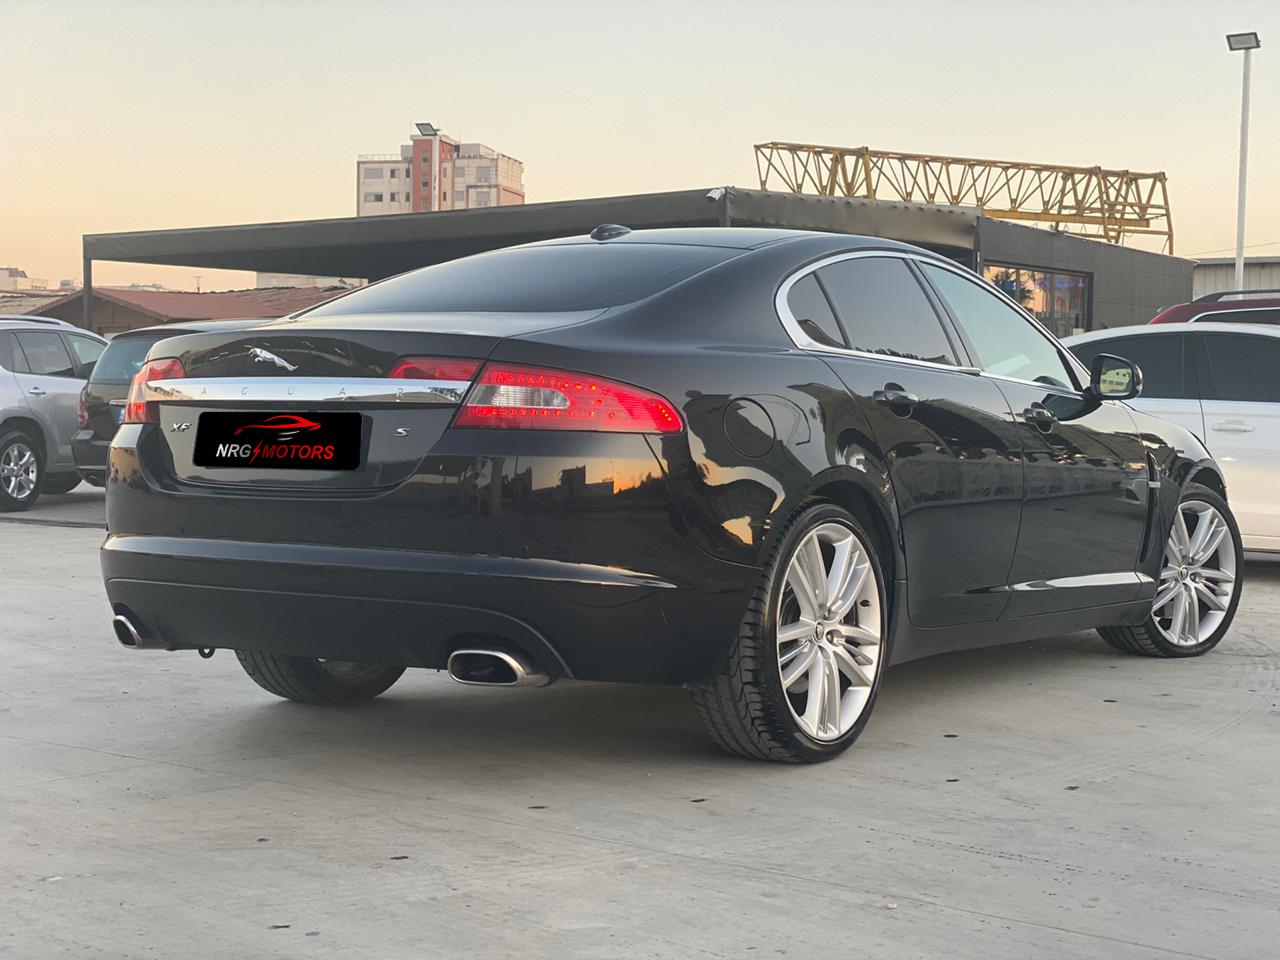 Jaguar XF S 2010 3.0 Diesel - NRG Motors Albania